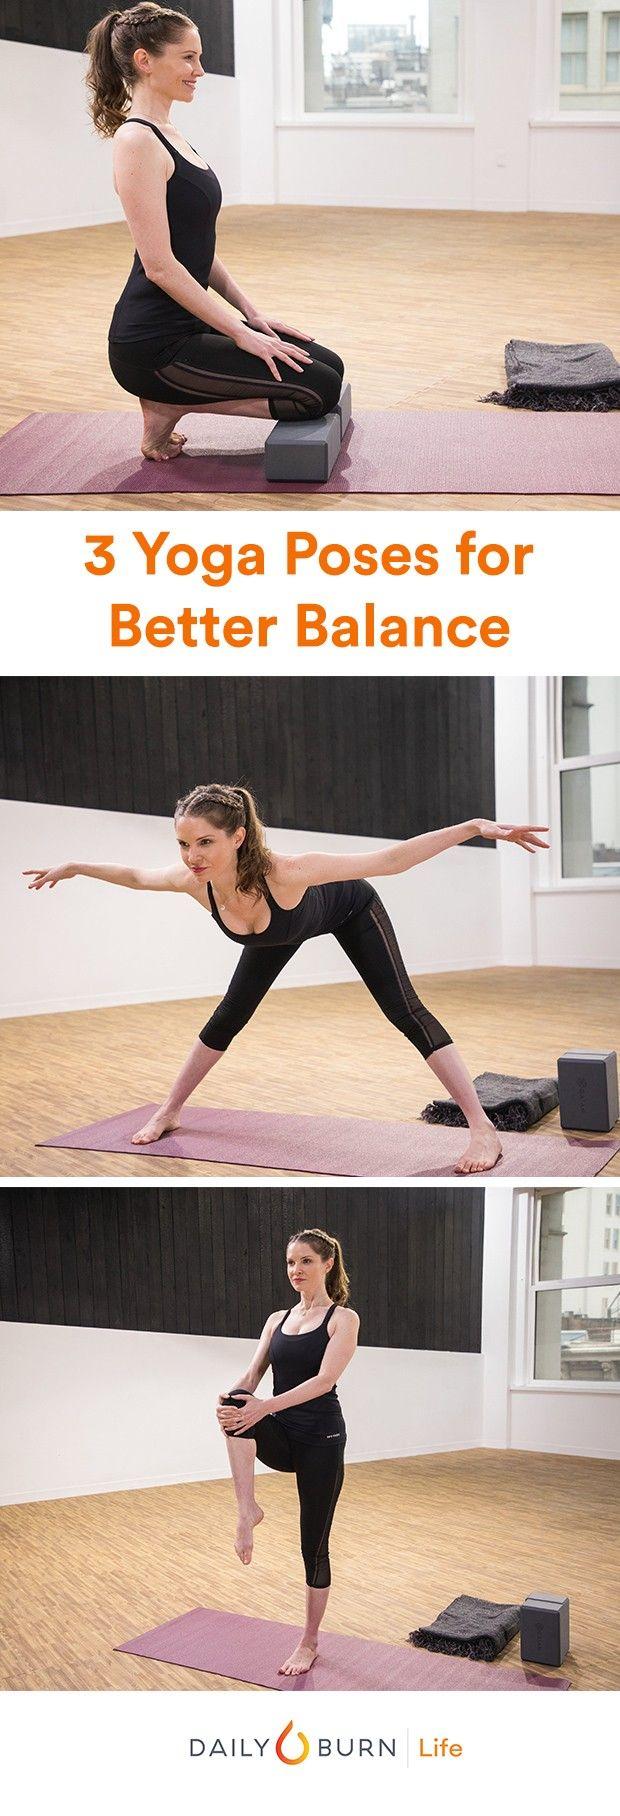 50 Beginner Yoga Poses for Better Balance   Yoga poses, Yoga poses ...